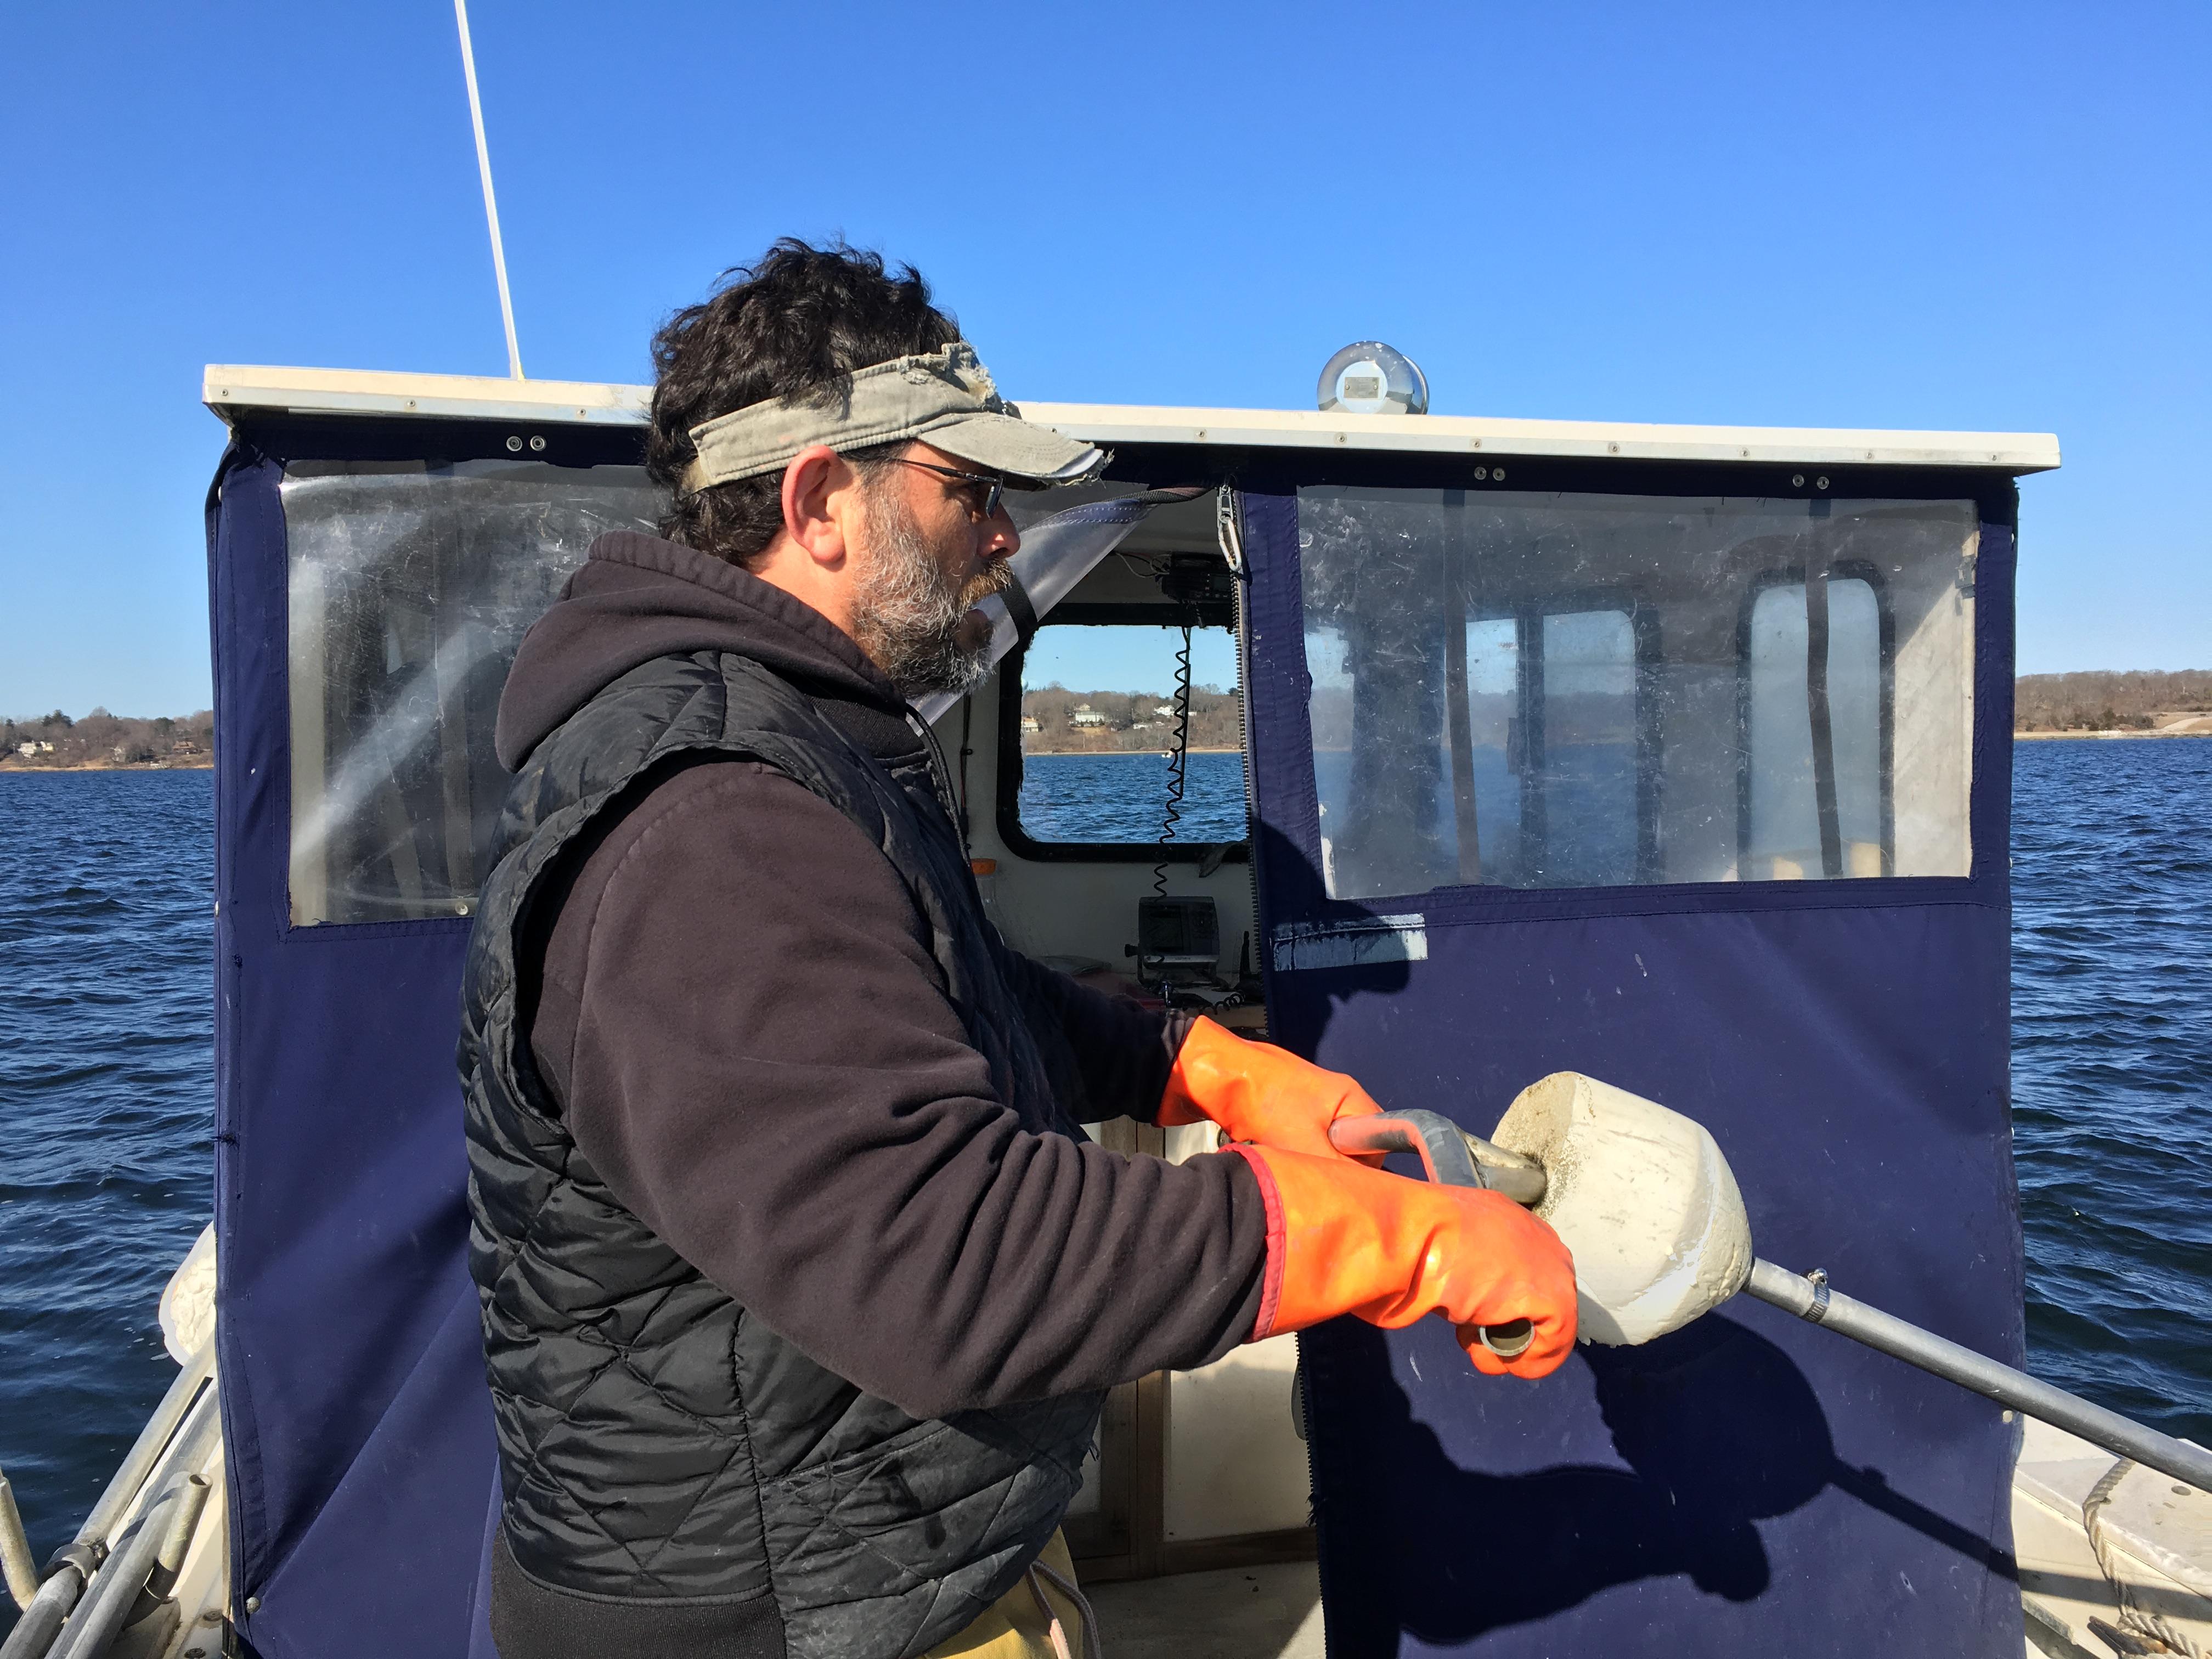 Ghigliotti uses the bullrake to dig for quahogs on Narragansett Bay